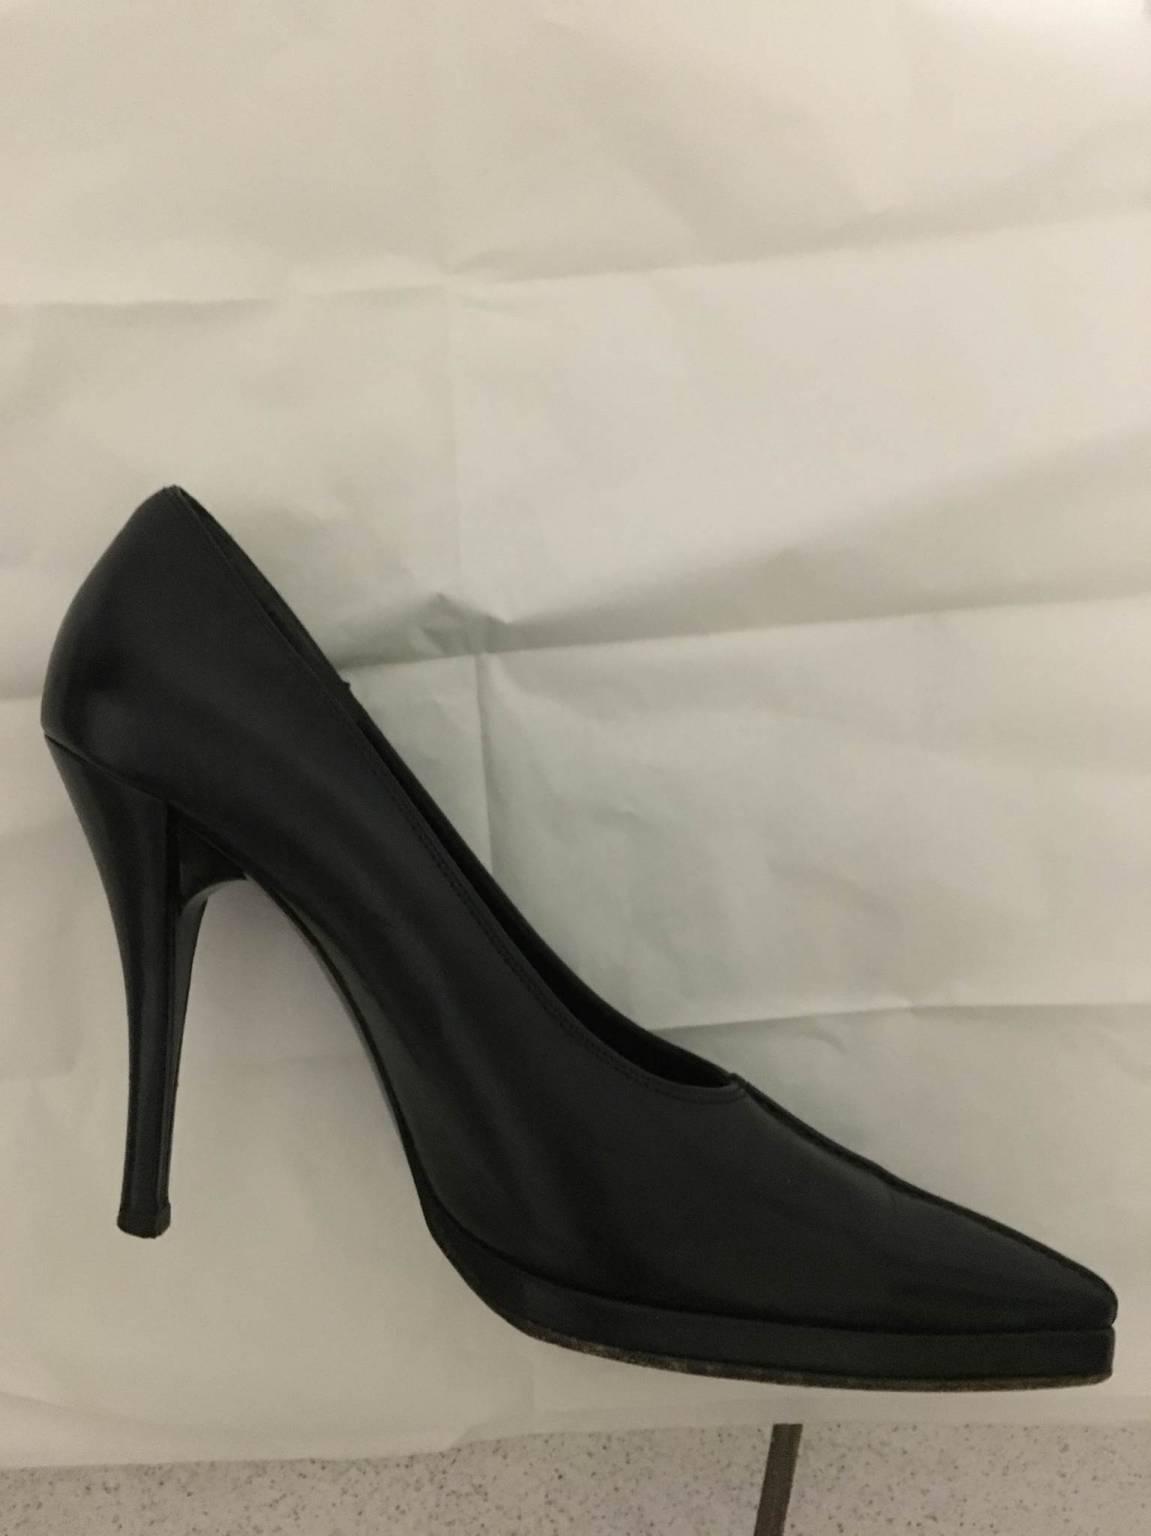 chaussures karl lagerfeld chaussures femmes. Black Bedroom Furniture Sets. Home Design Ideas